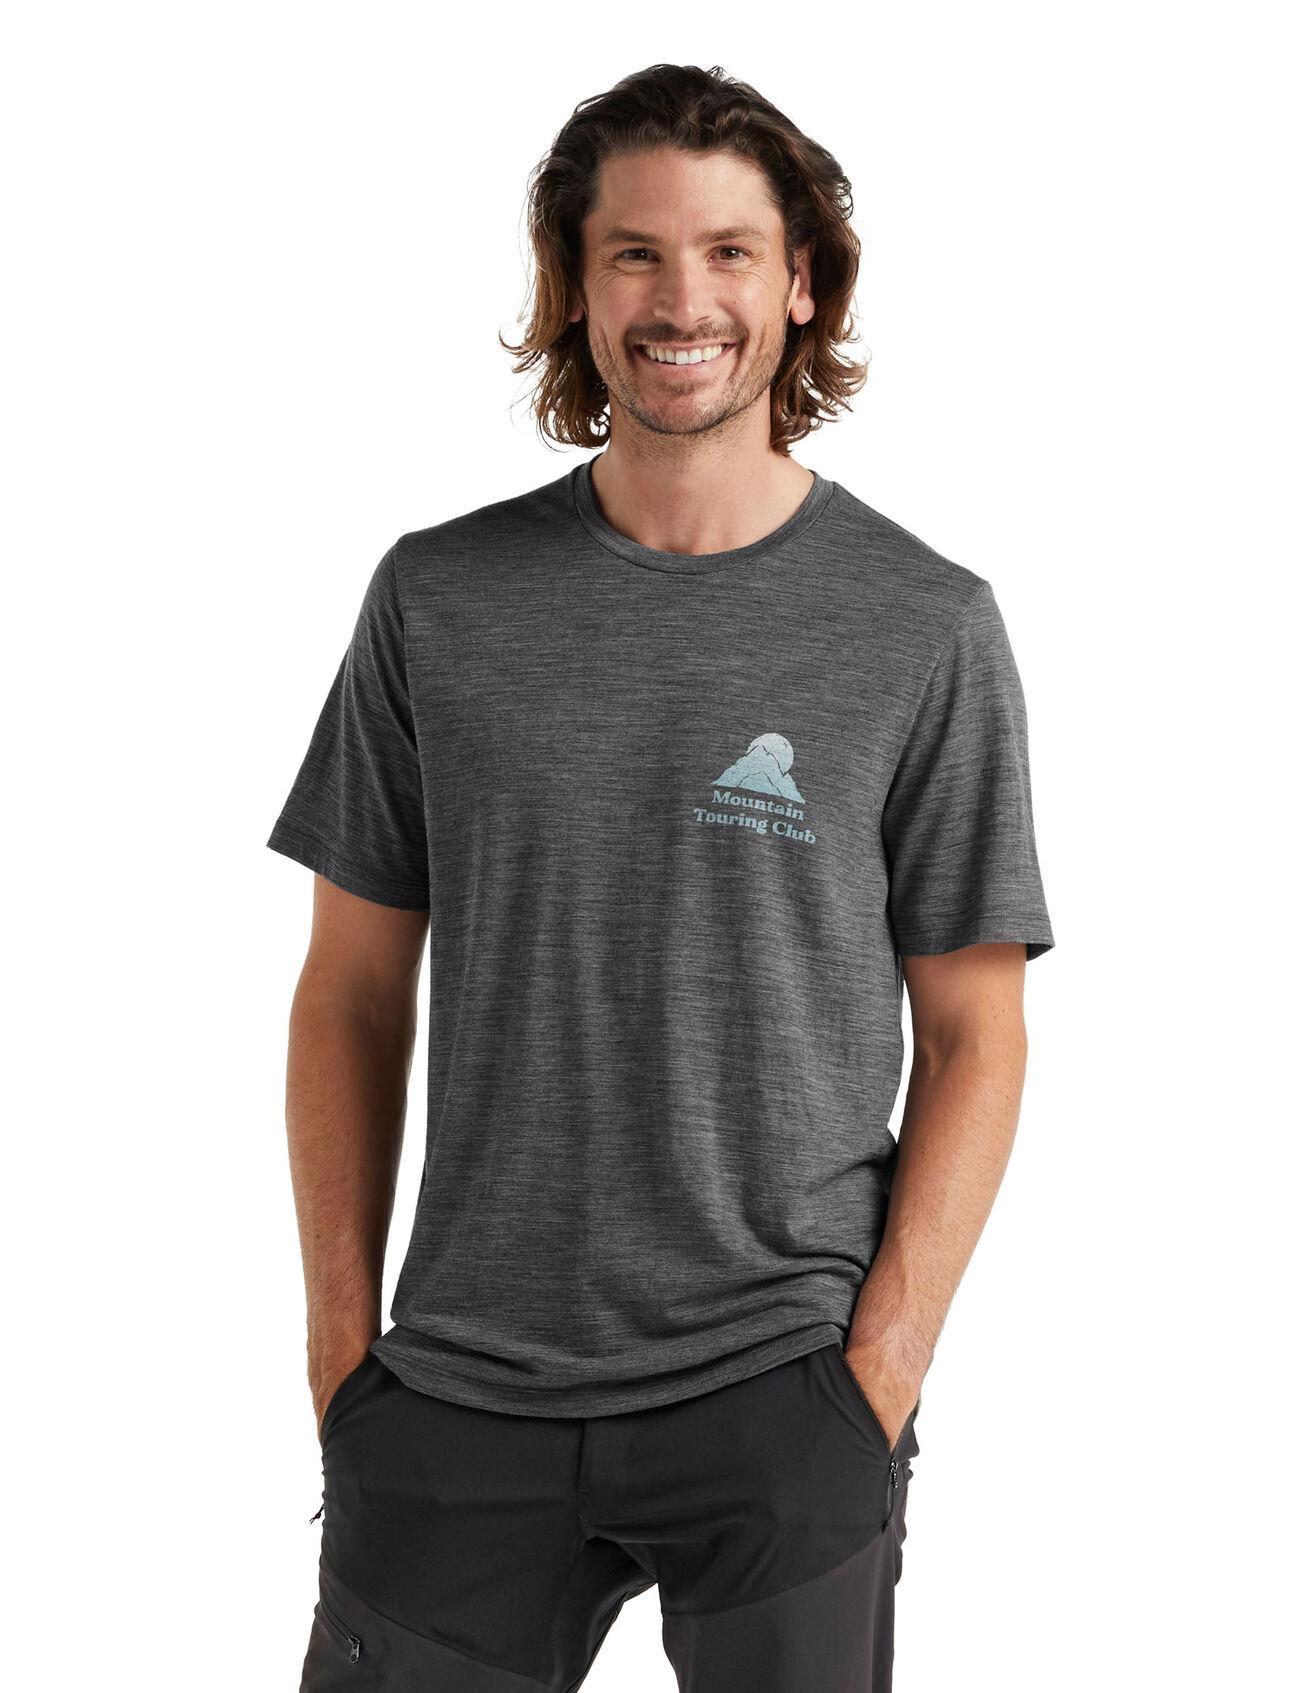 Tech Lite II T-shirt Mountain Touring Club met korte mouwen van merinowol